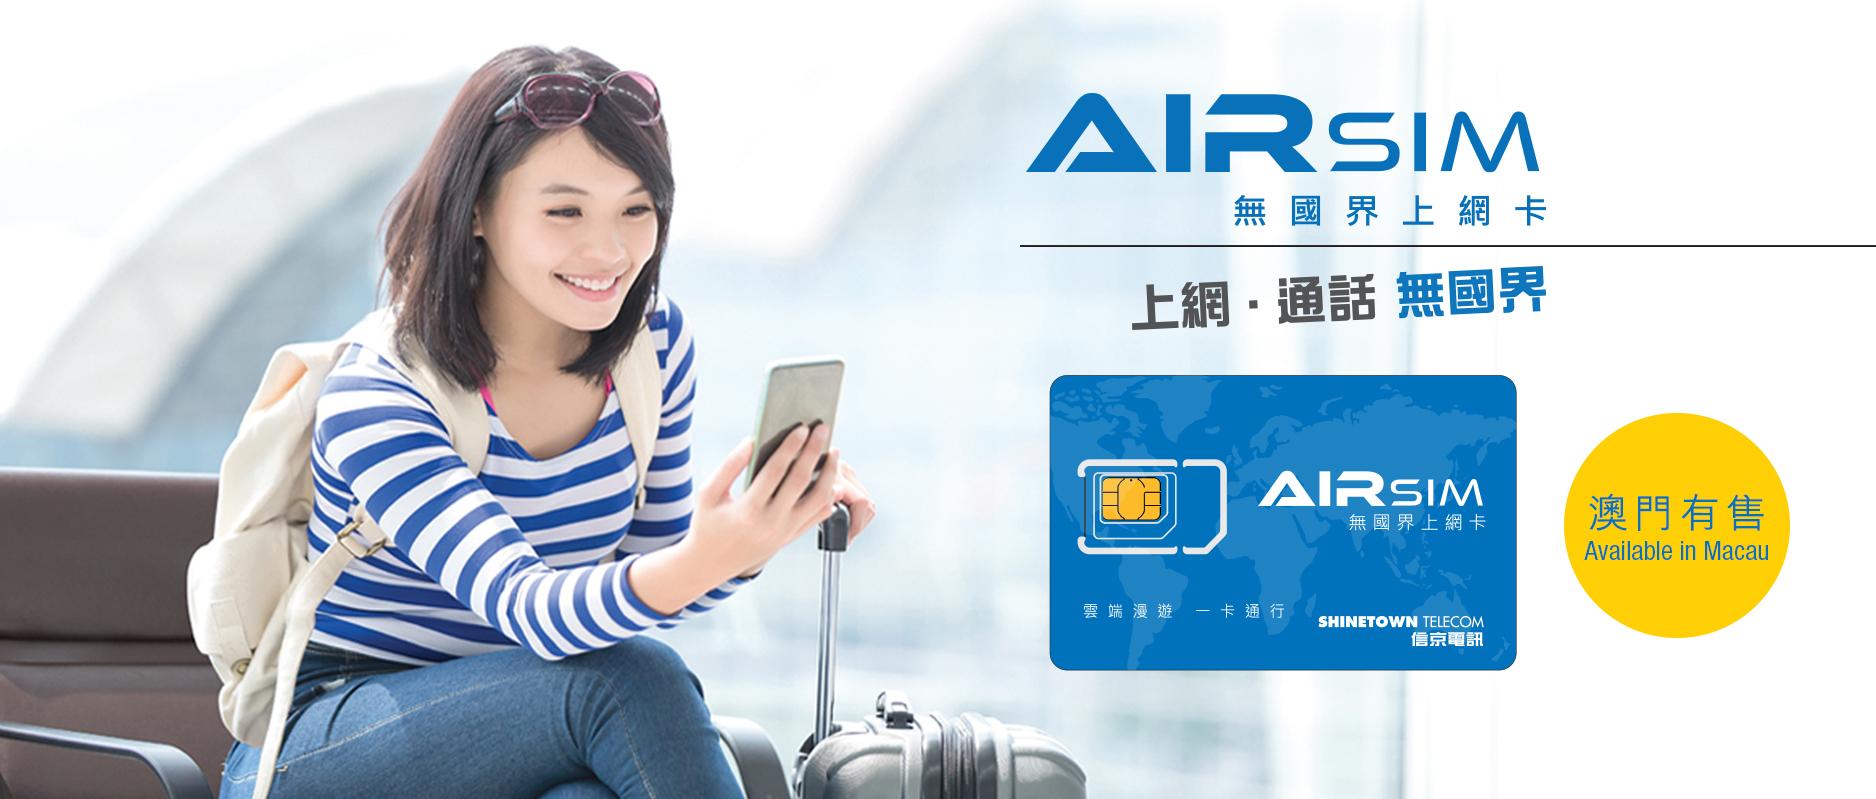 Web Banner_AIRSIM-Macau.jpg